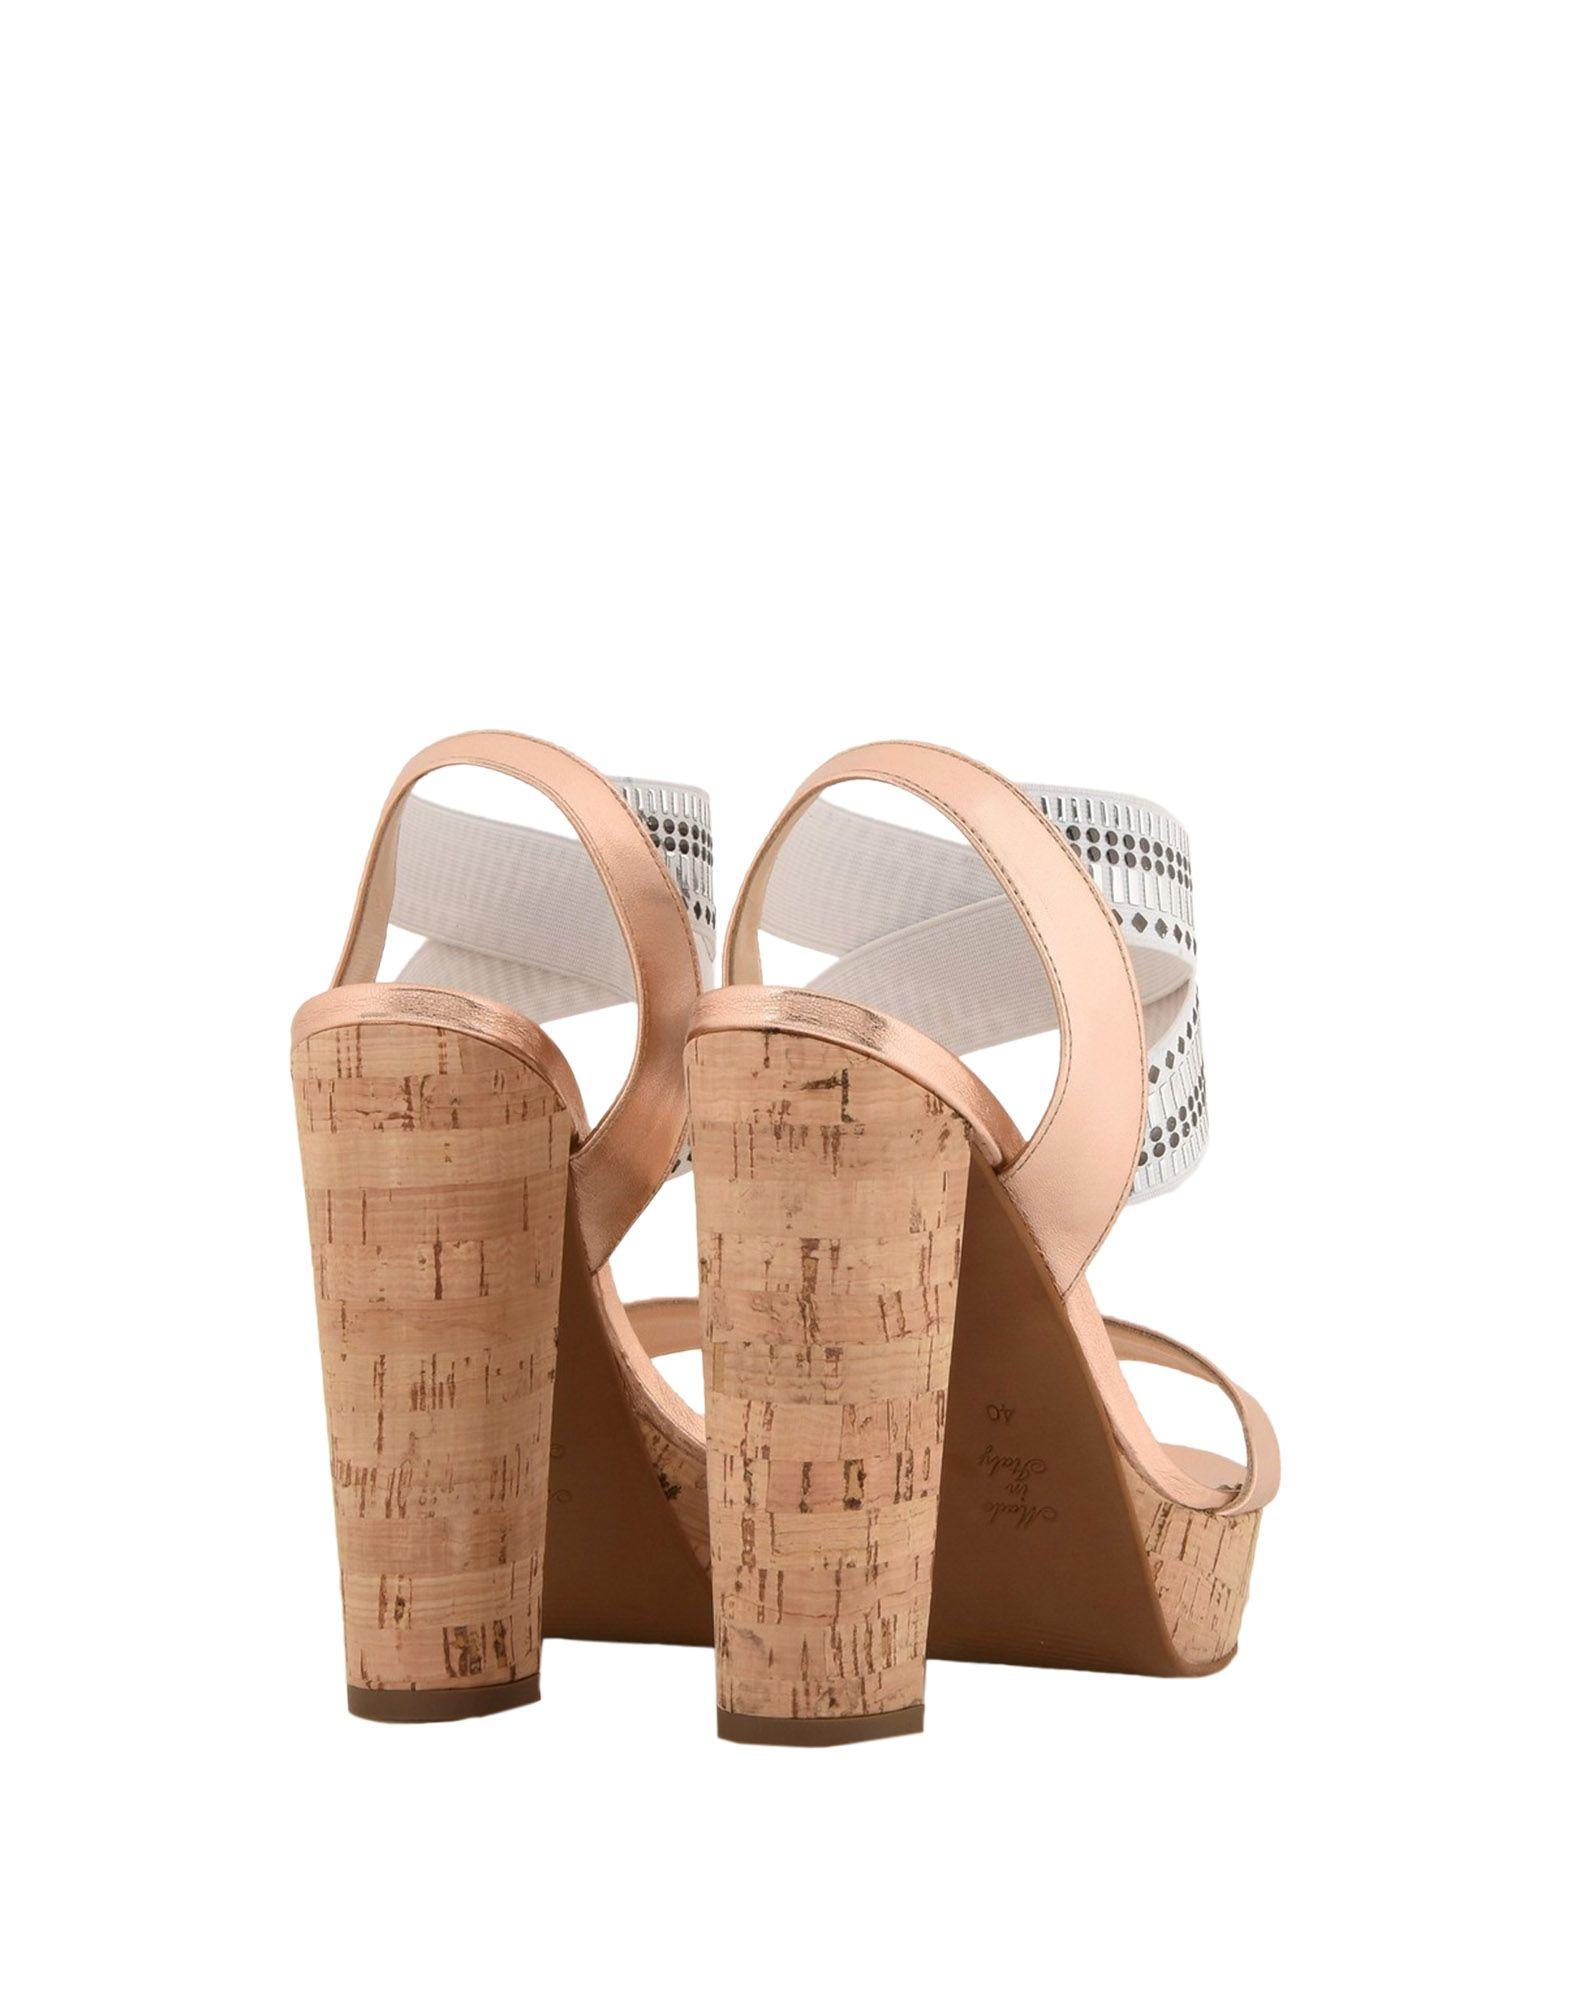 Pierre Darré Sandalen Damen 11240528AC Gute beliebte Qualität beliebte Gute Schuhe c41374